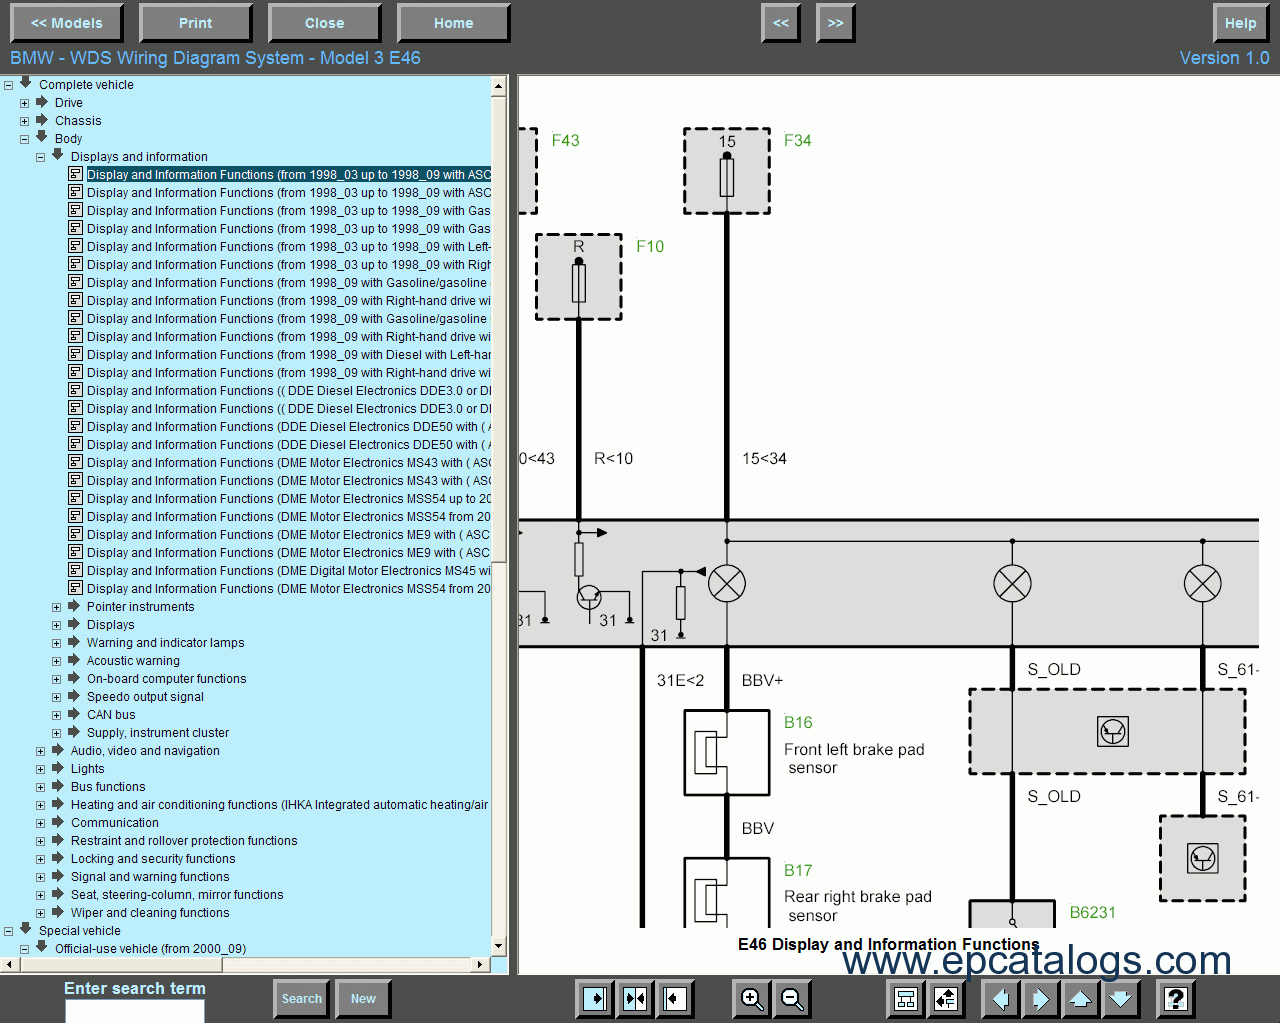 Bmw Factory Wiring Diagrams 27 Wiring Diagram Images Wiring 2004 Mini  Cooper Headlight Wiring Diagram E60 Bmw Factory Wiring Diagrams